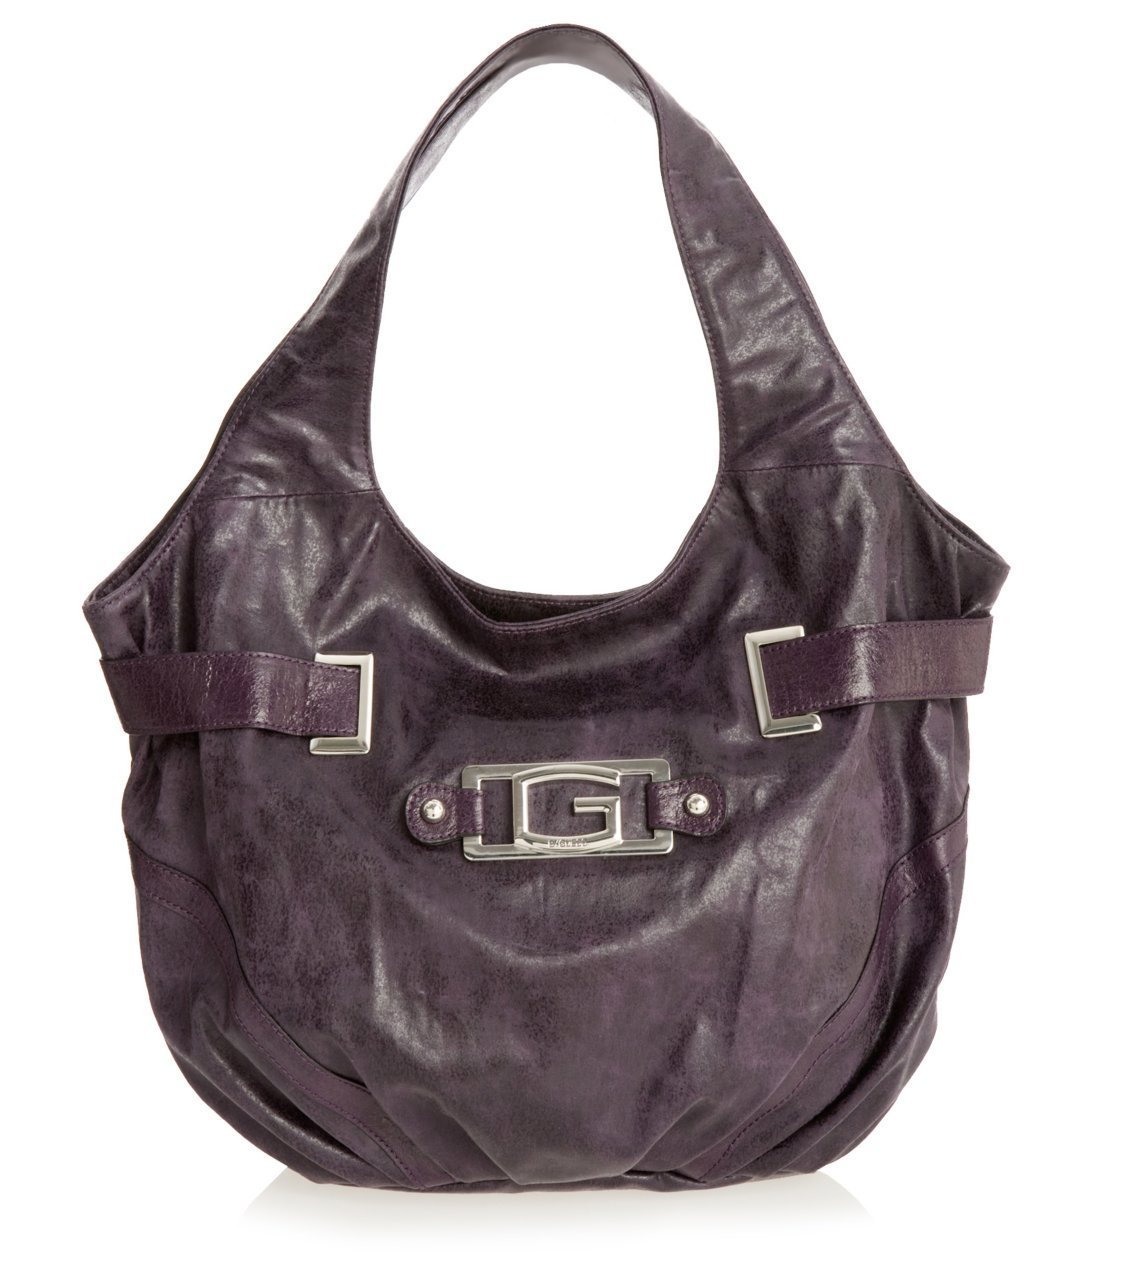 My New Handbag: Attractive Guess Handbags